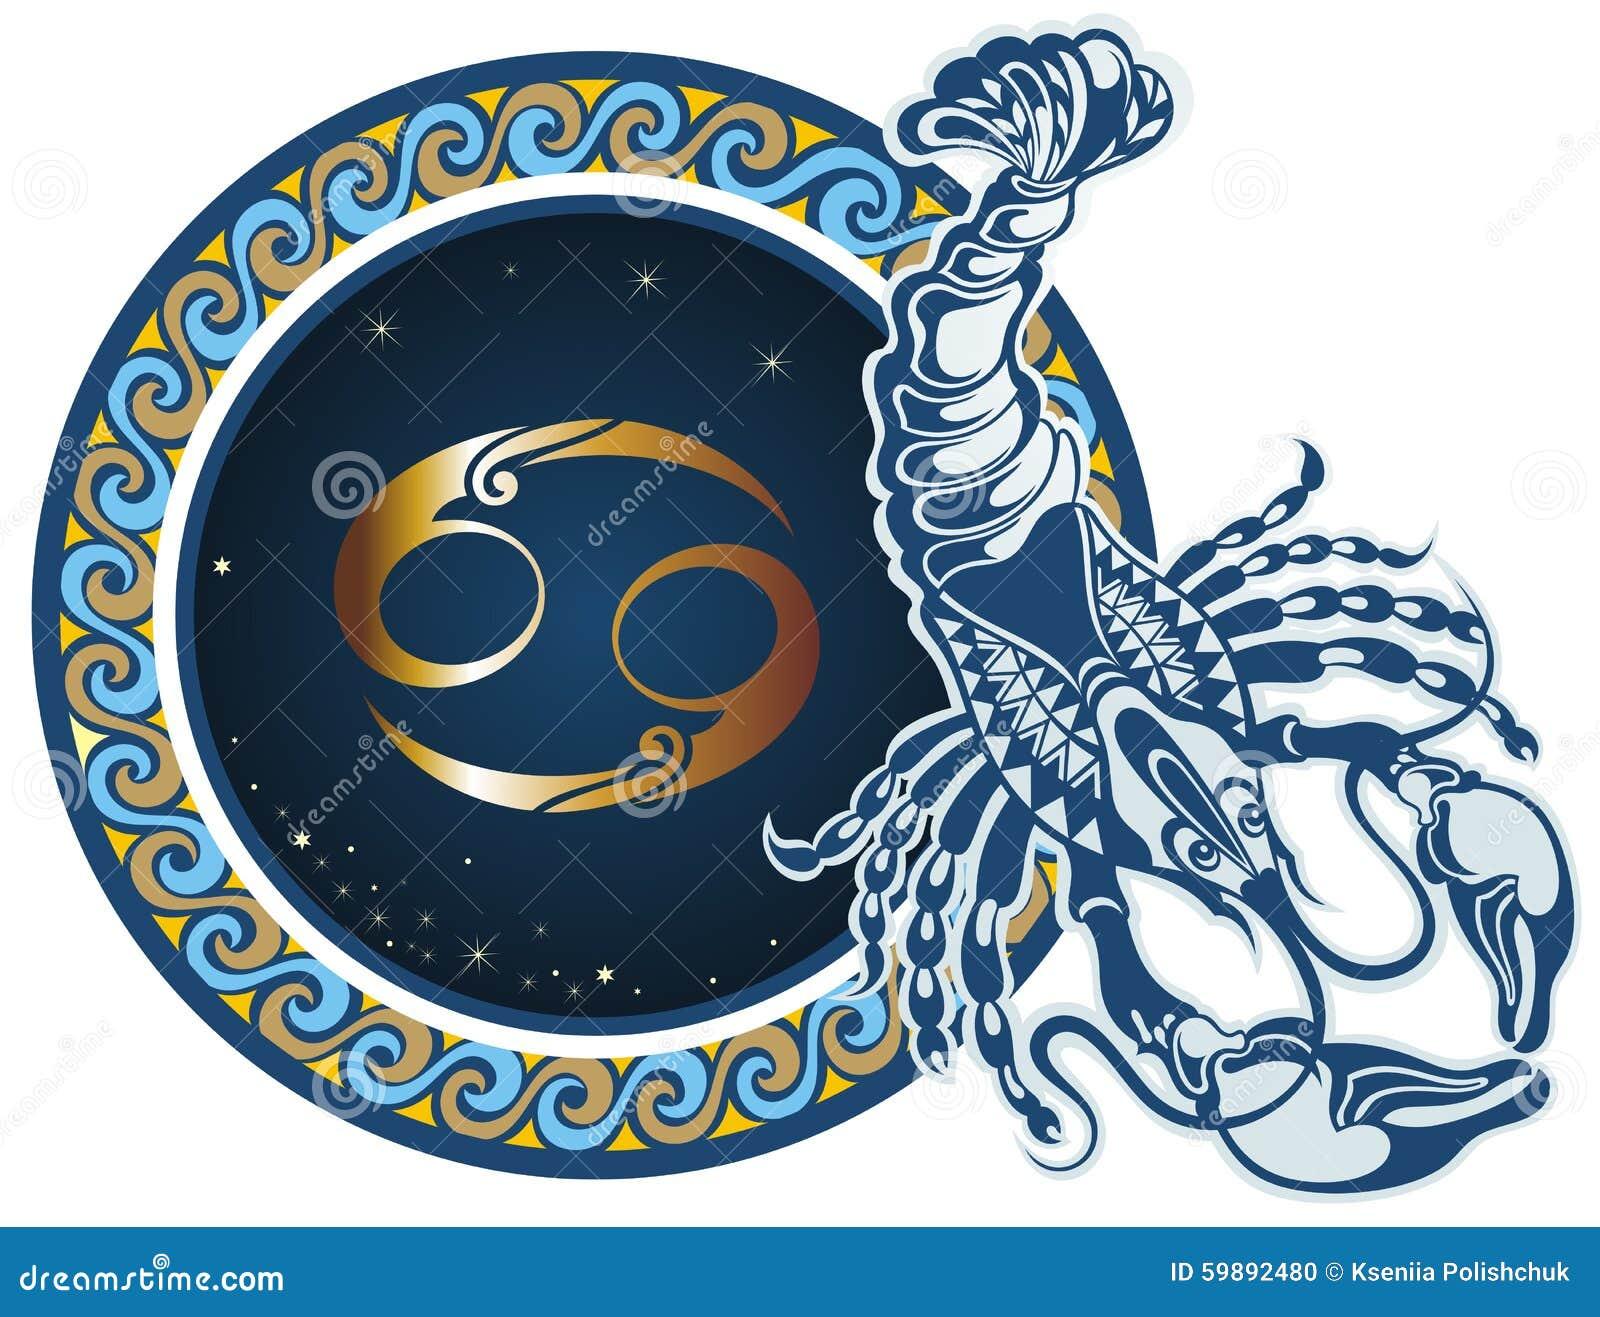 Signes de zodiaque - Cancer